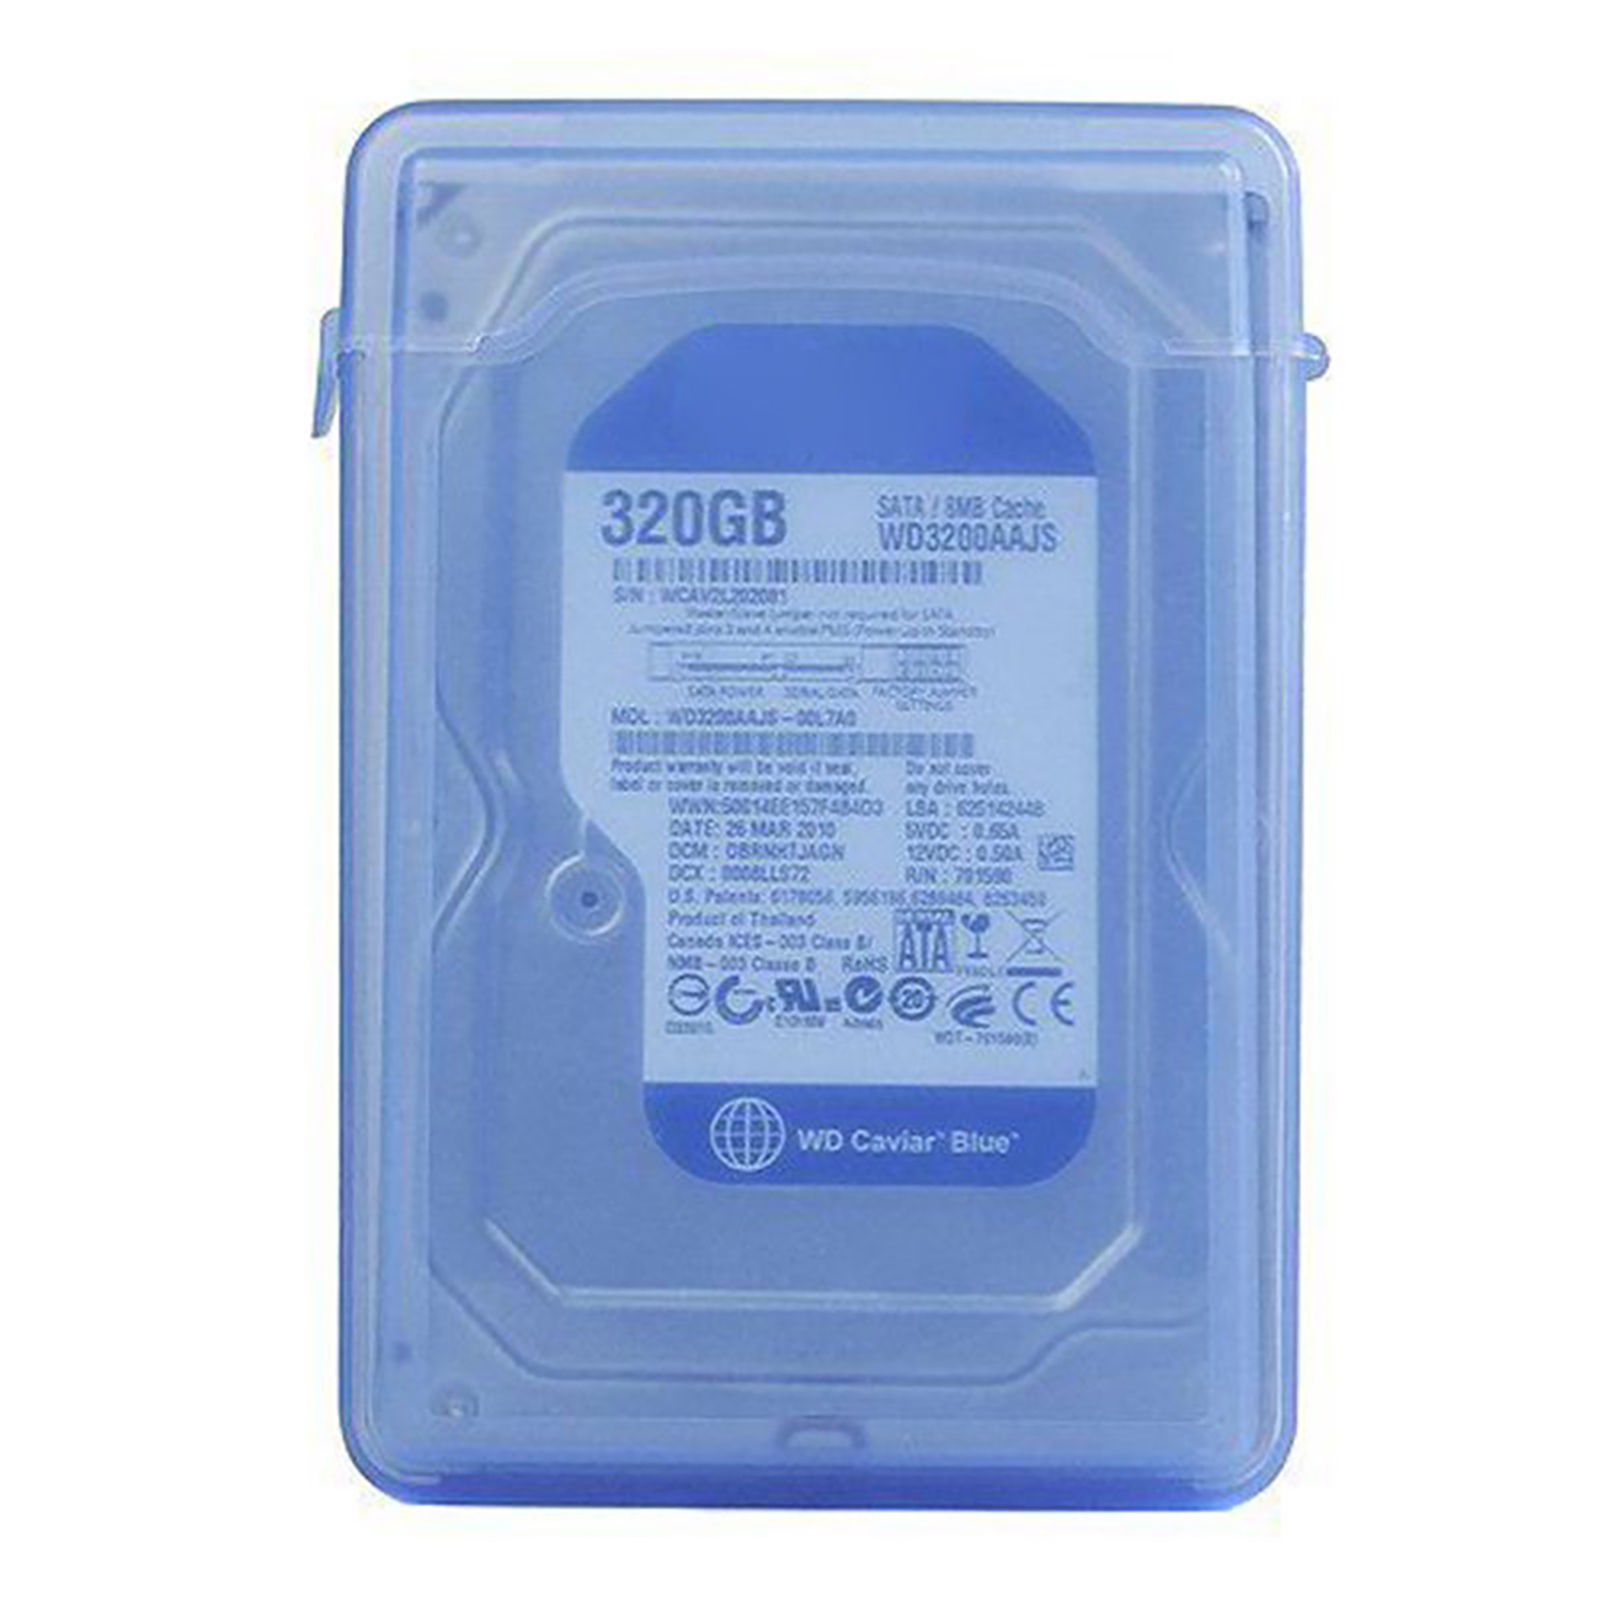 Protection-Plastic-Storage-Box-Case-Enclosure-for-3-5-039-039-SATA-HDD-Hard-Drive-Disk thumbnail 11